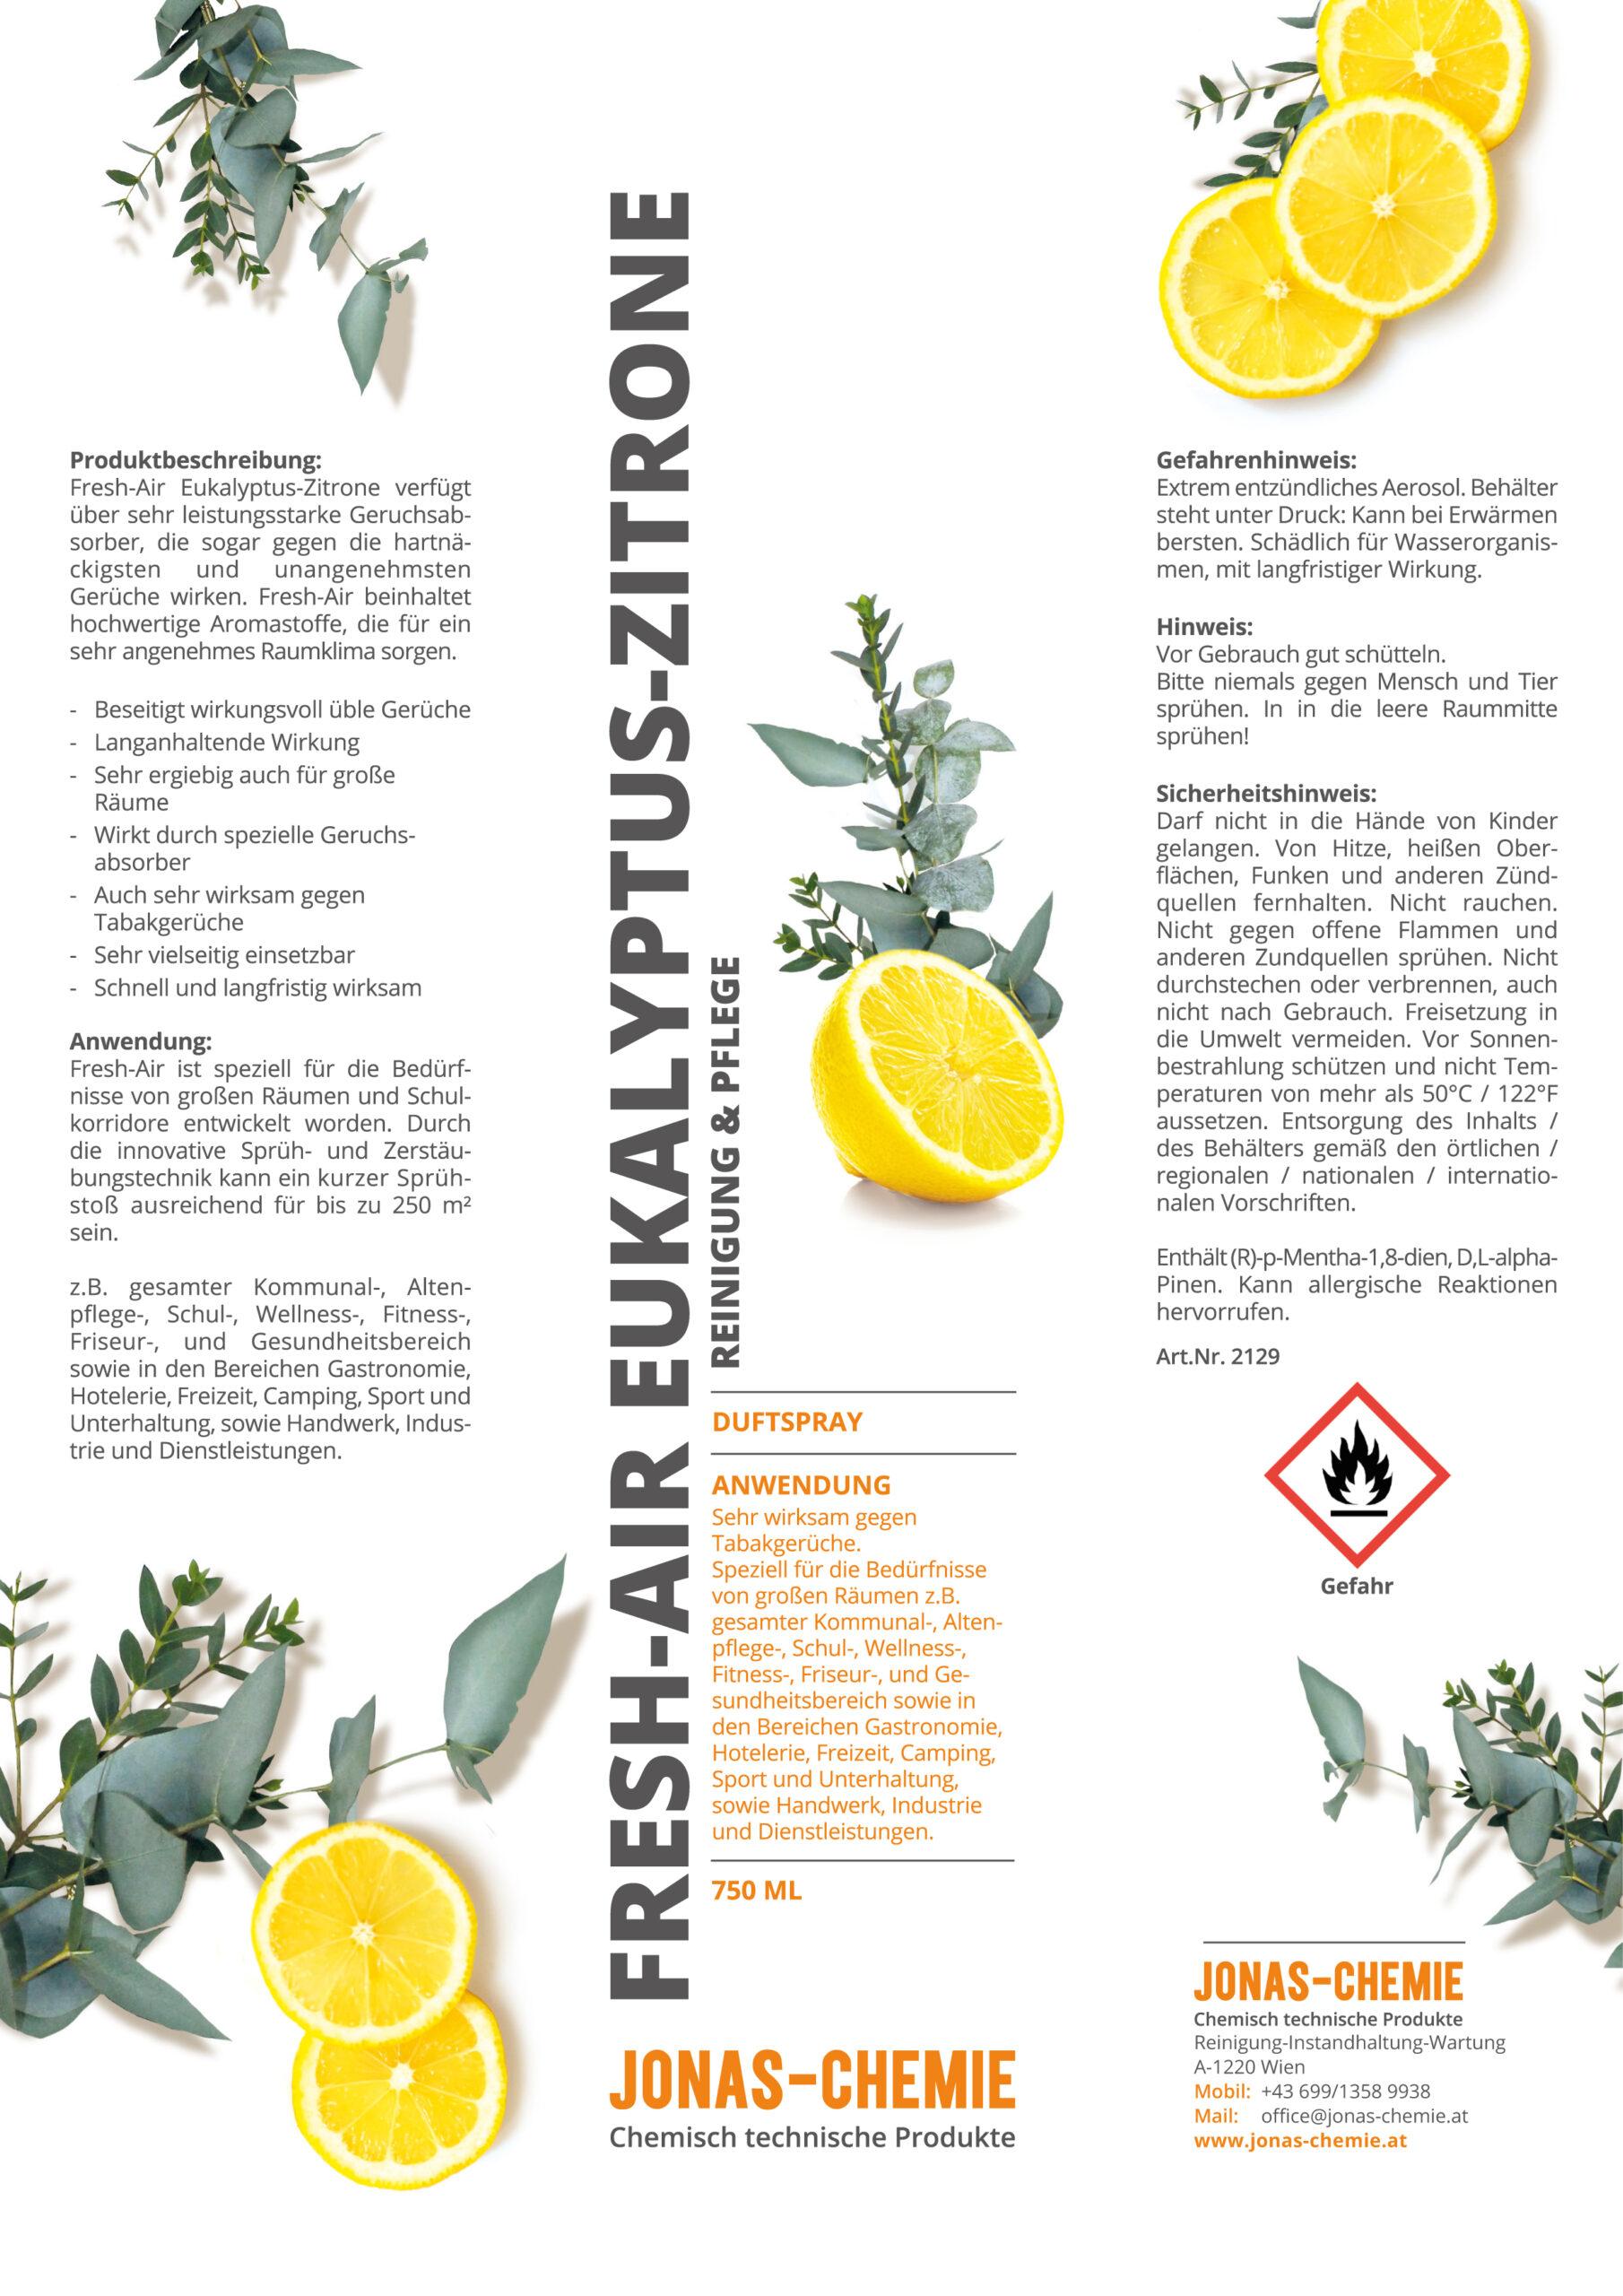 Jonas-Chemie_Aufkleber-Dose_Reiniger_210x297_gr_FreshAir_Eukalyp